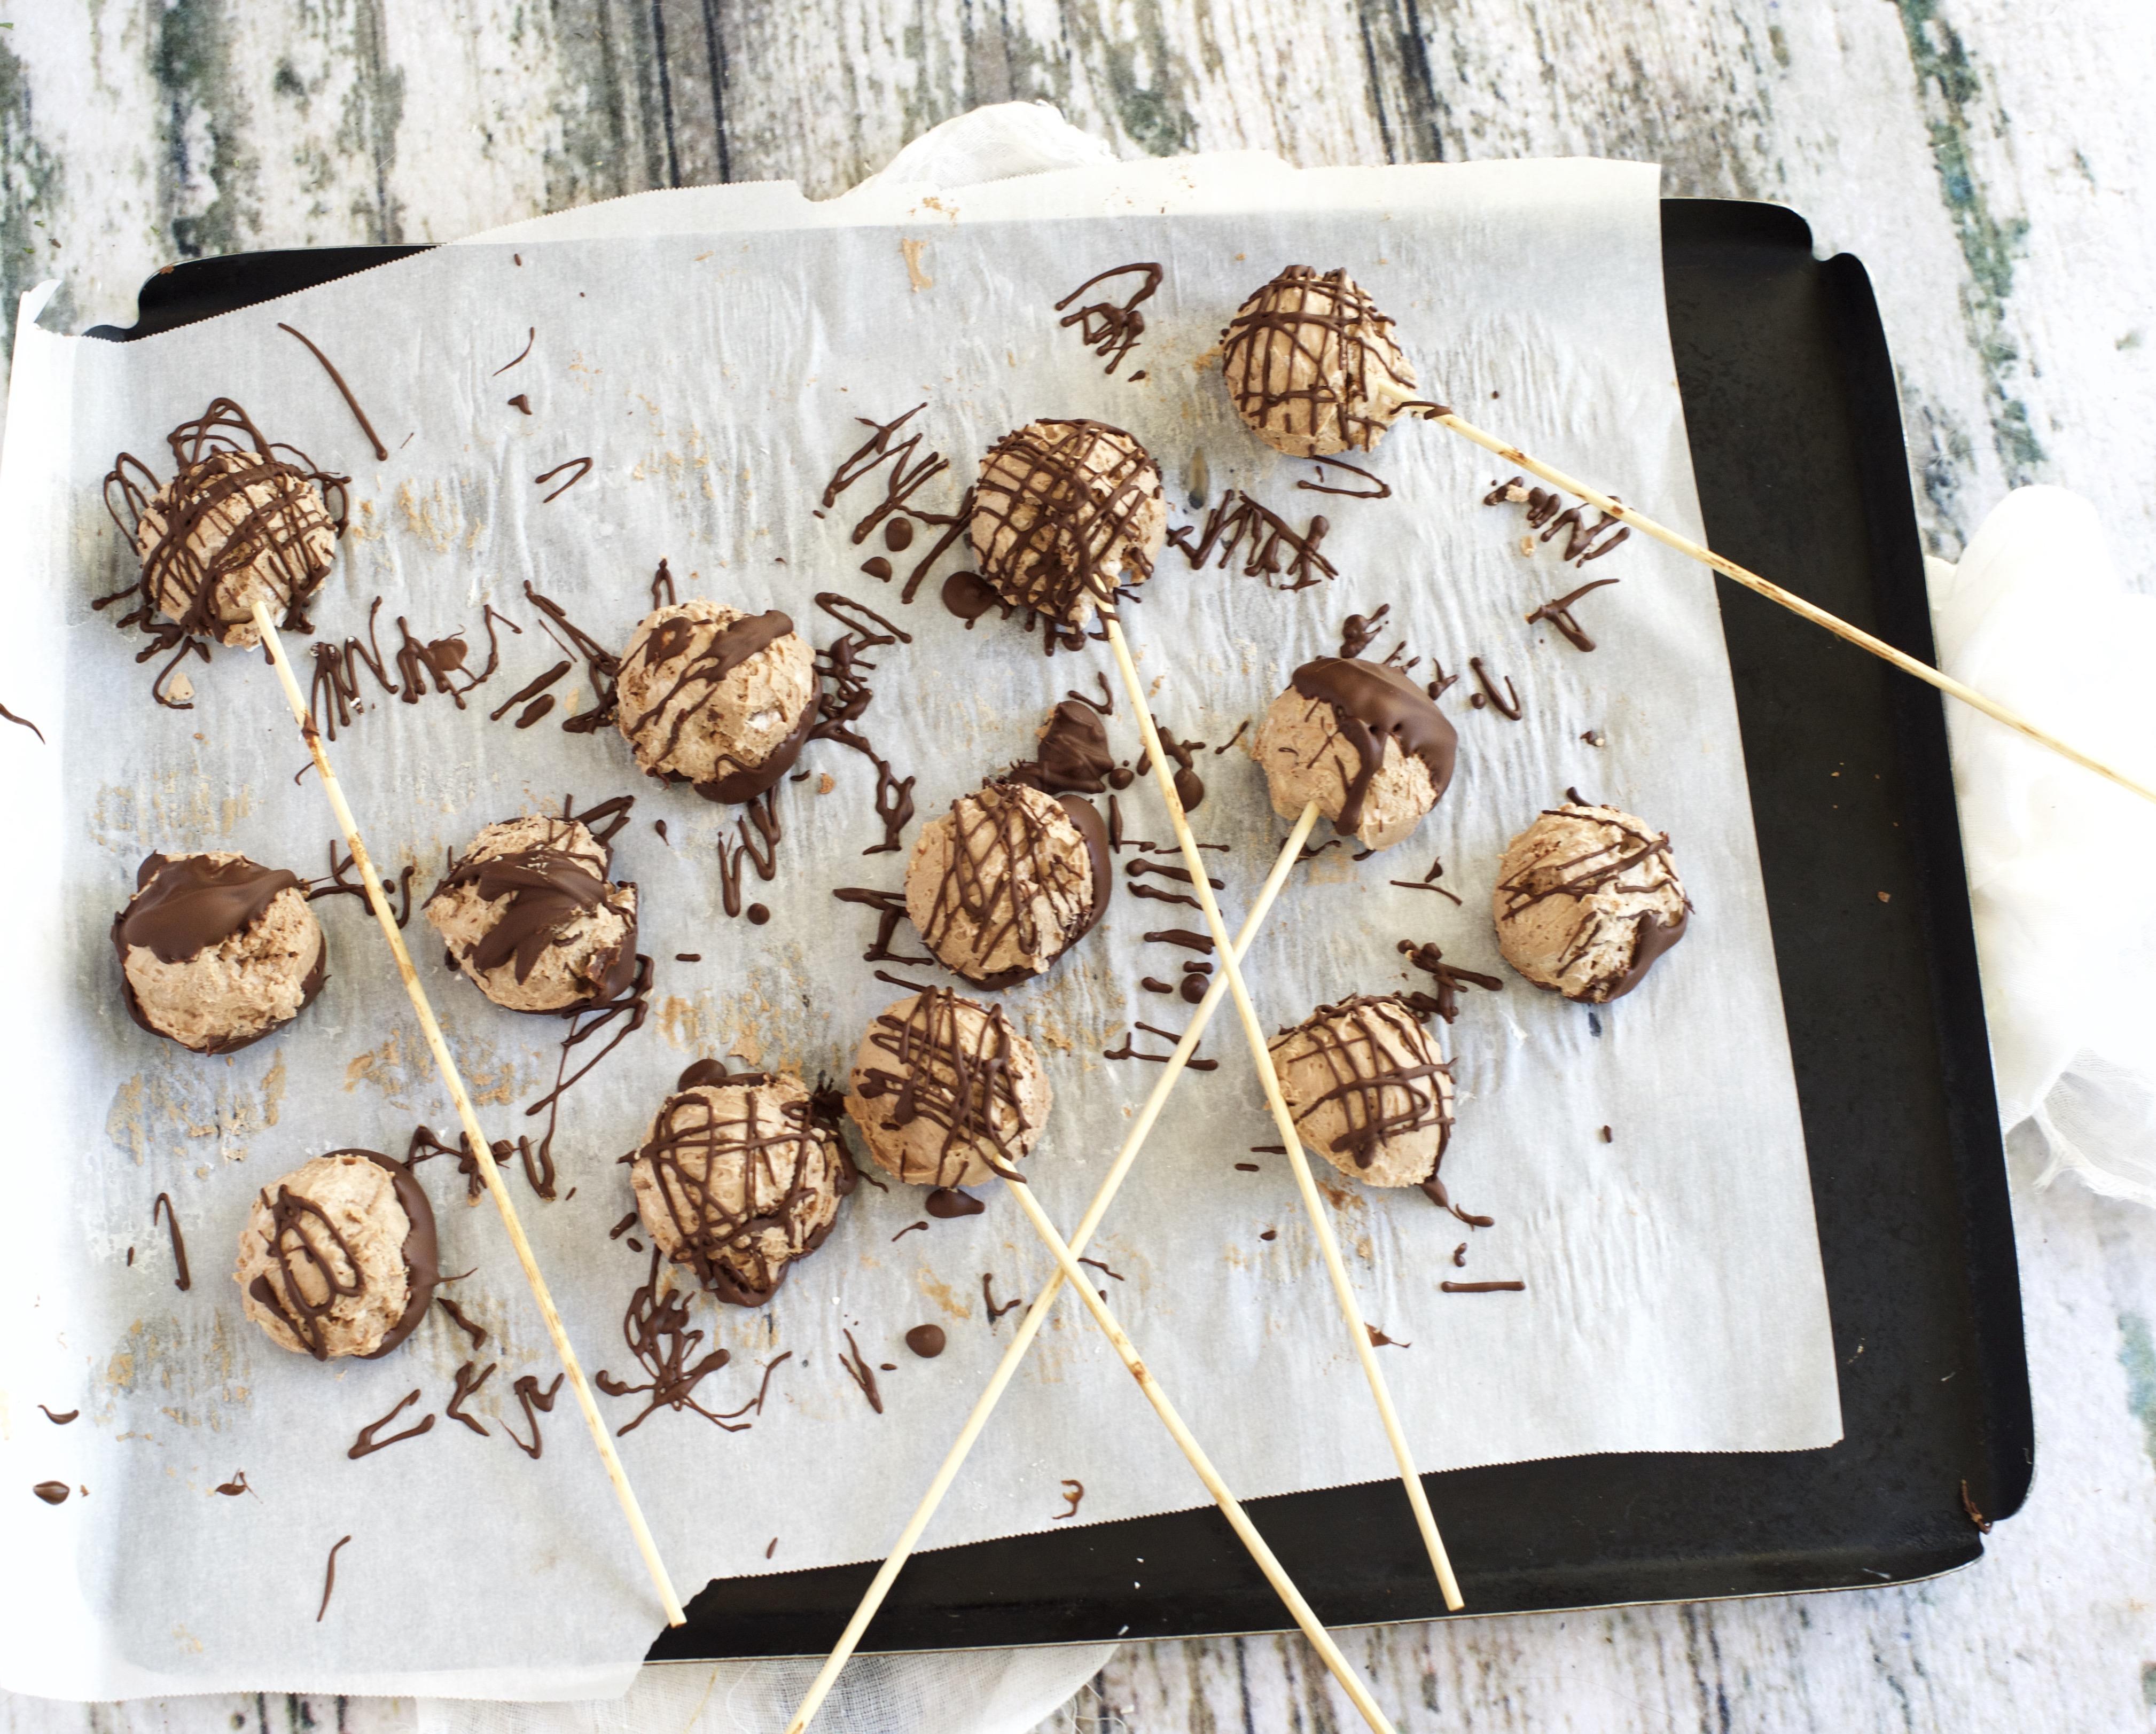 Low-Carb Chocolate Truffles